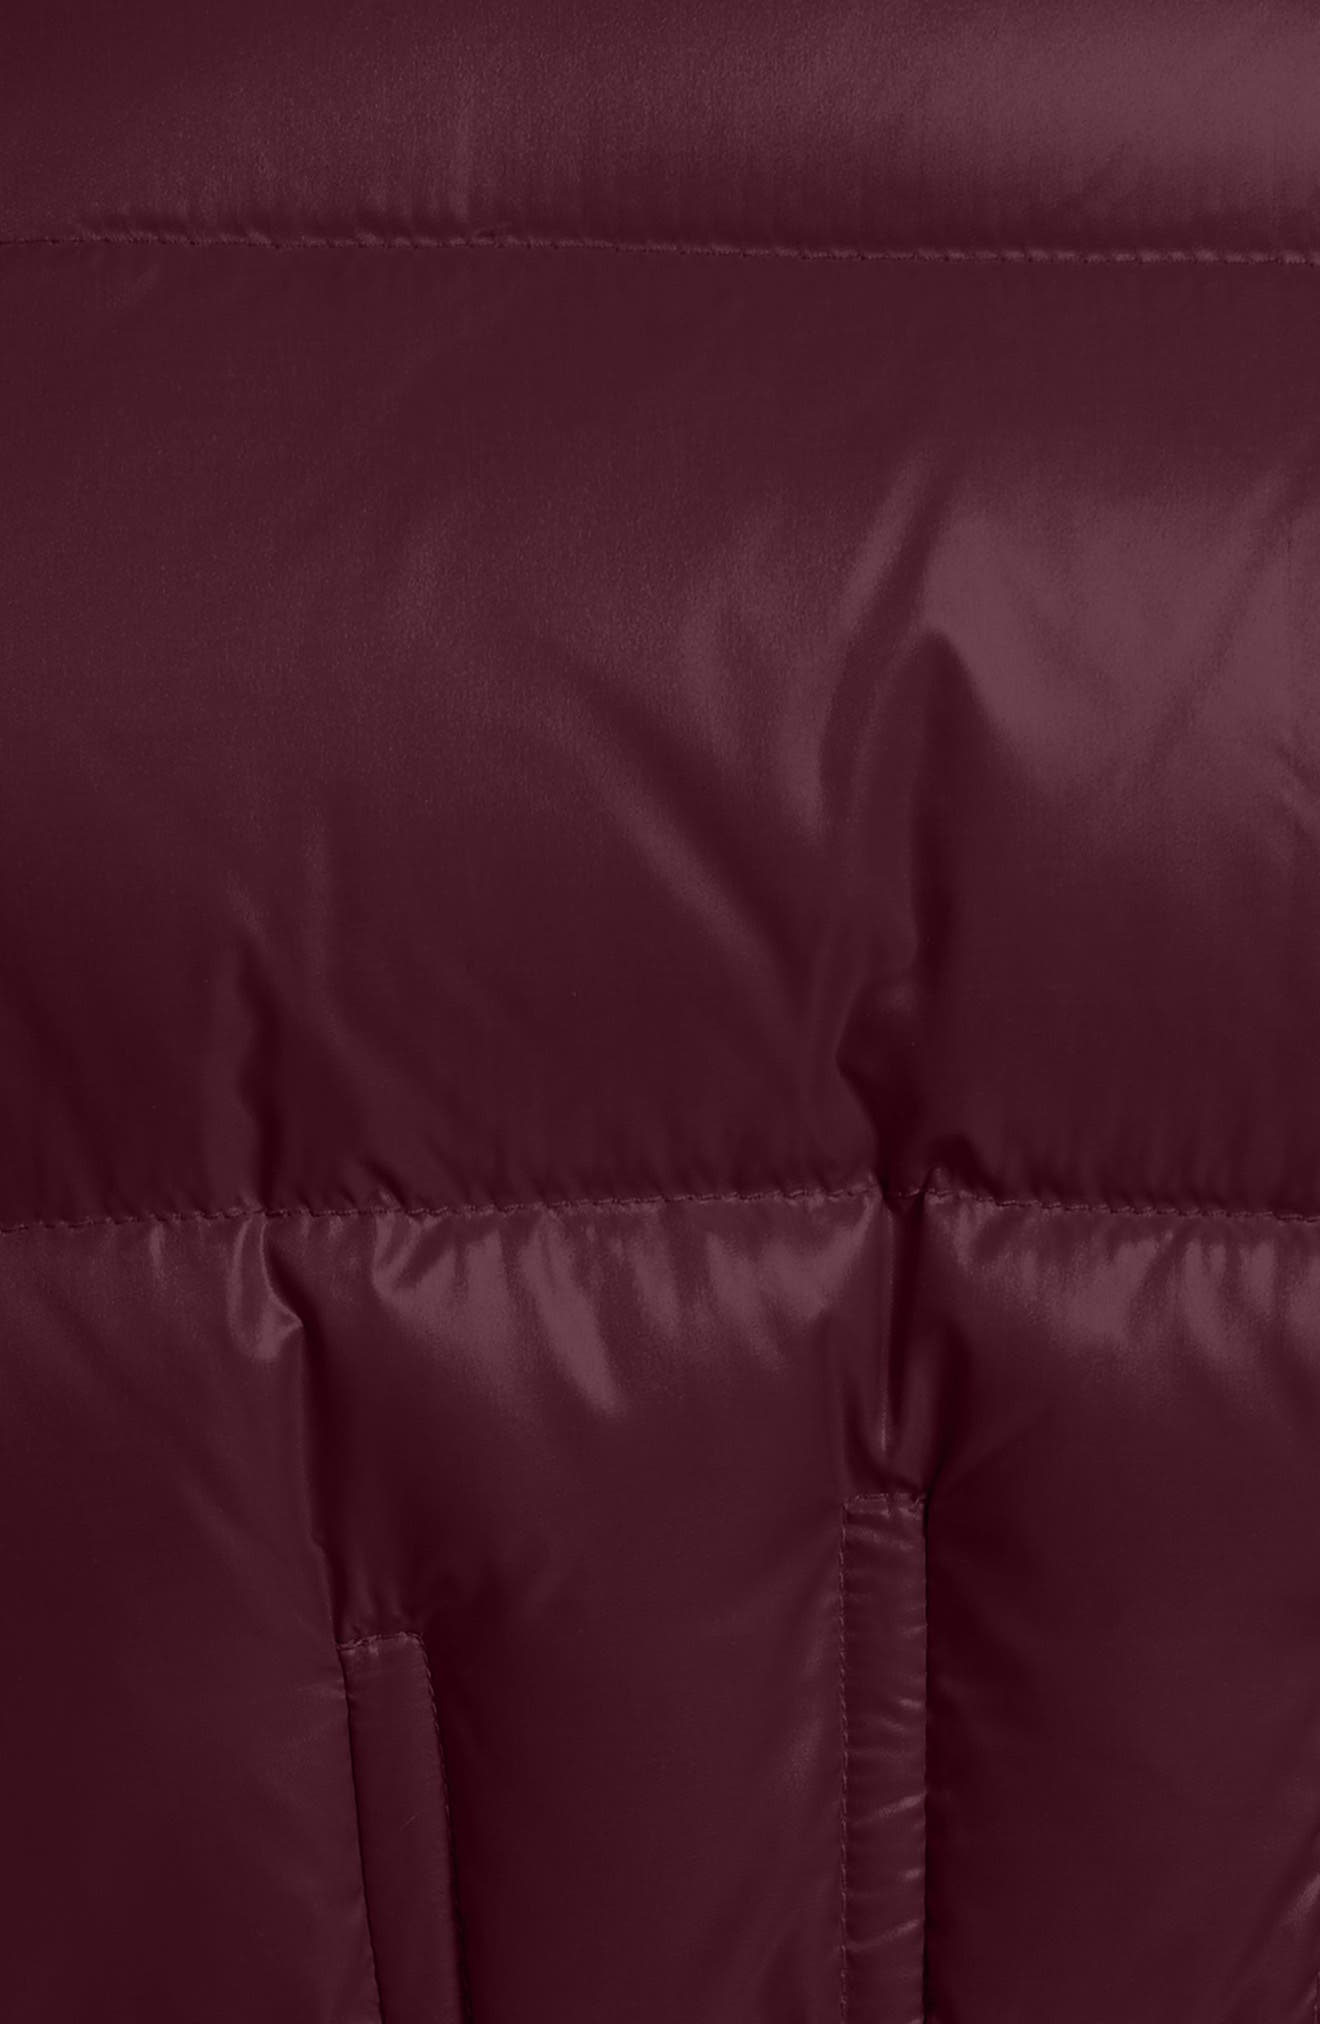 Danae Down Puffer Jacket,                             Alternate thumbnail 6, color,                             BURGUNDY